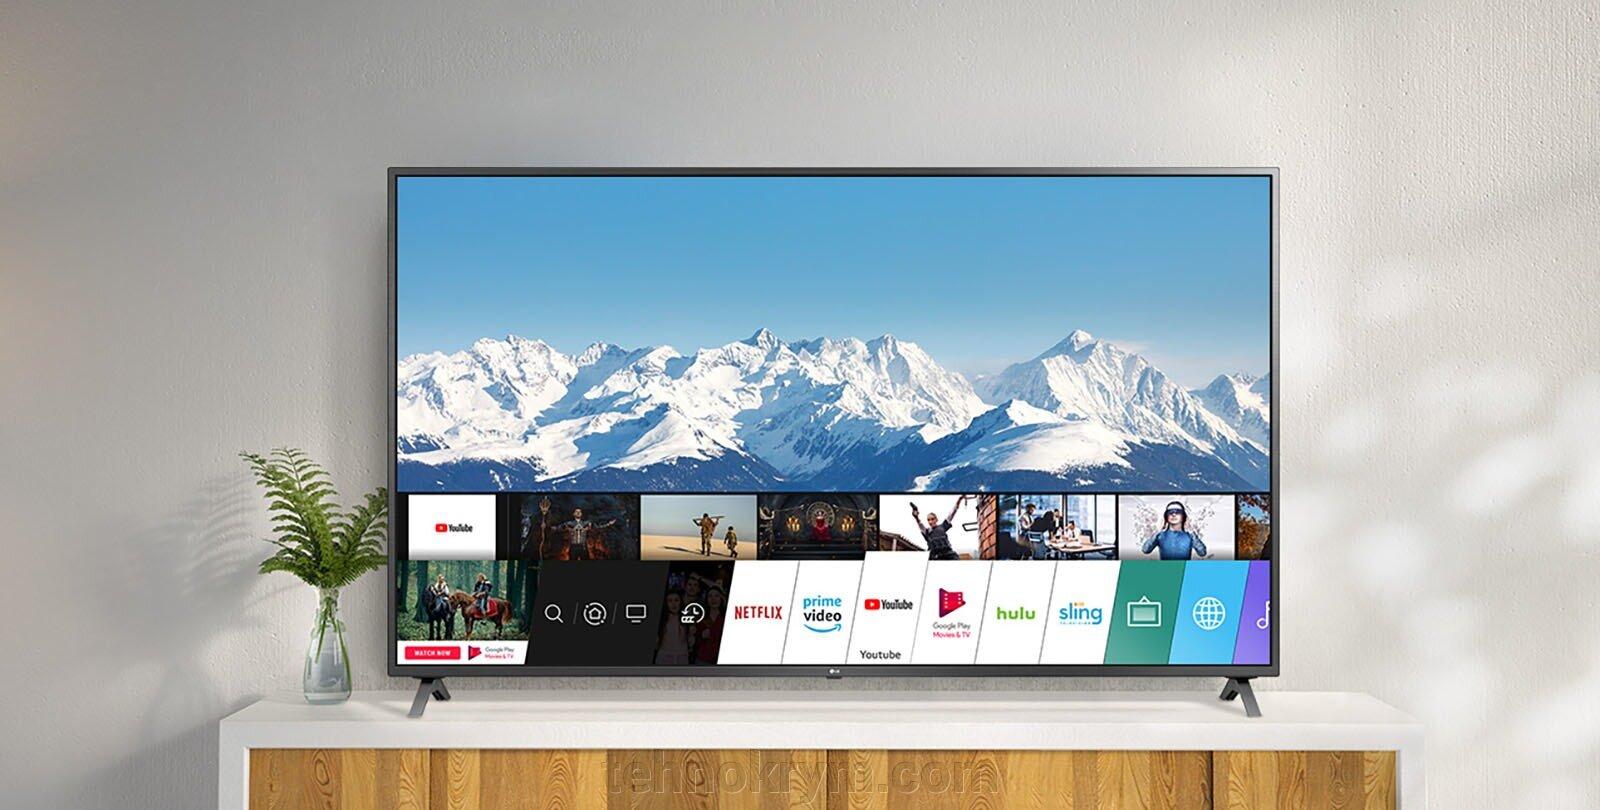 Smart телевизор LG 43UN71006LB, Ultra HD, черный, webOS 5.0 - фото pic_58b78e19bbd78321c219b260d80811fc_1920x9000_1.jpg